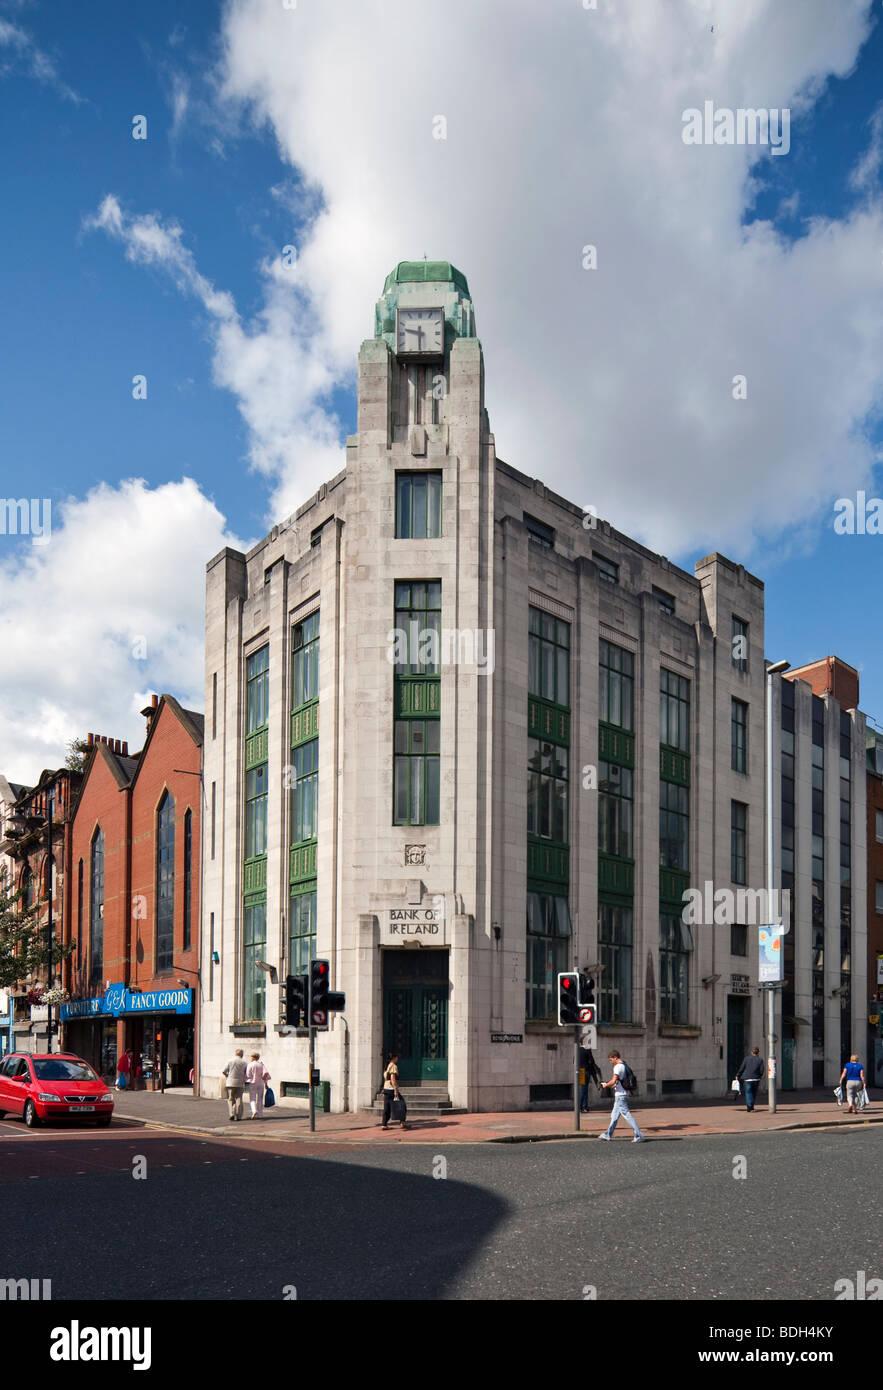 Former Bank of Ireland building, Royal Avenue, Belfast, Northern Ireland - Stock Image